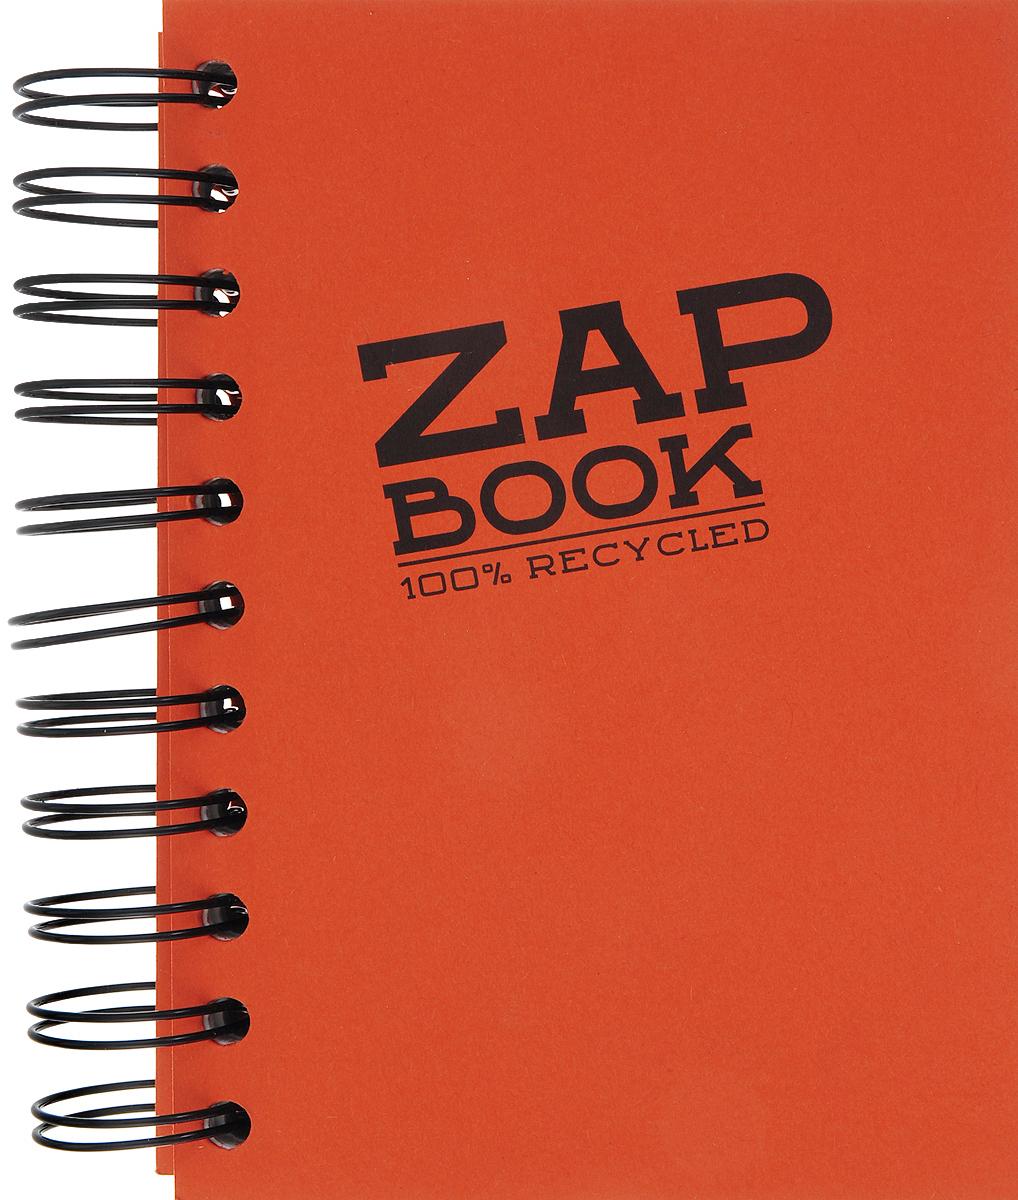 Блокнот Clairefontaine Zap Book, на спирали, цвет: оранжевый, формат A6, 160 листов блокнот clairefontaine rhodia точки формат a6 цвет обложки оранжевый 96 листов